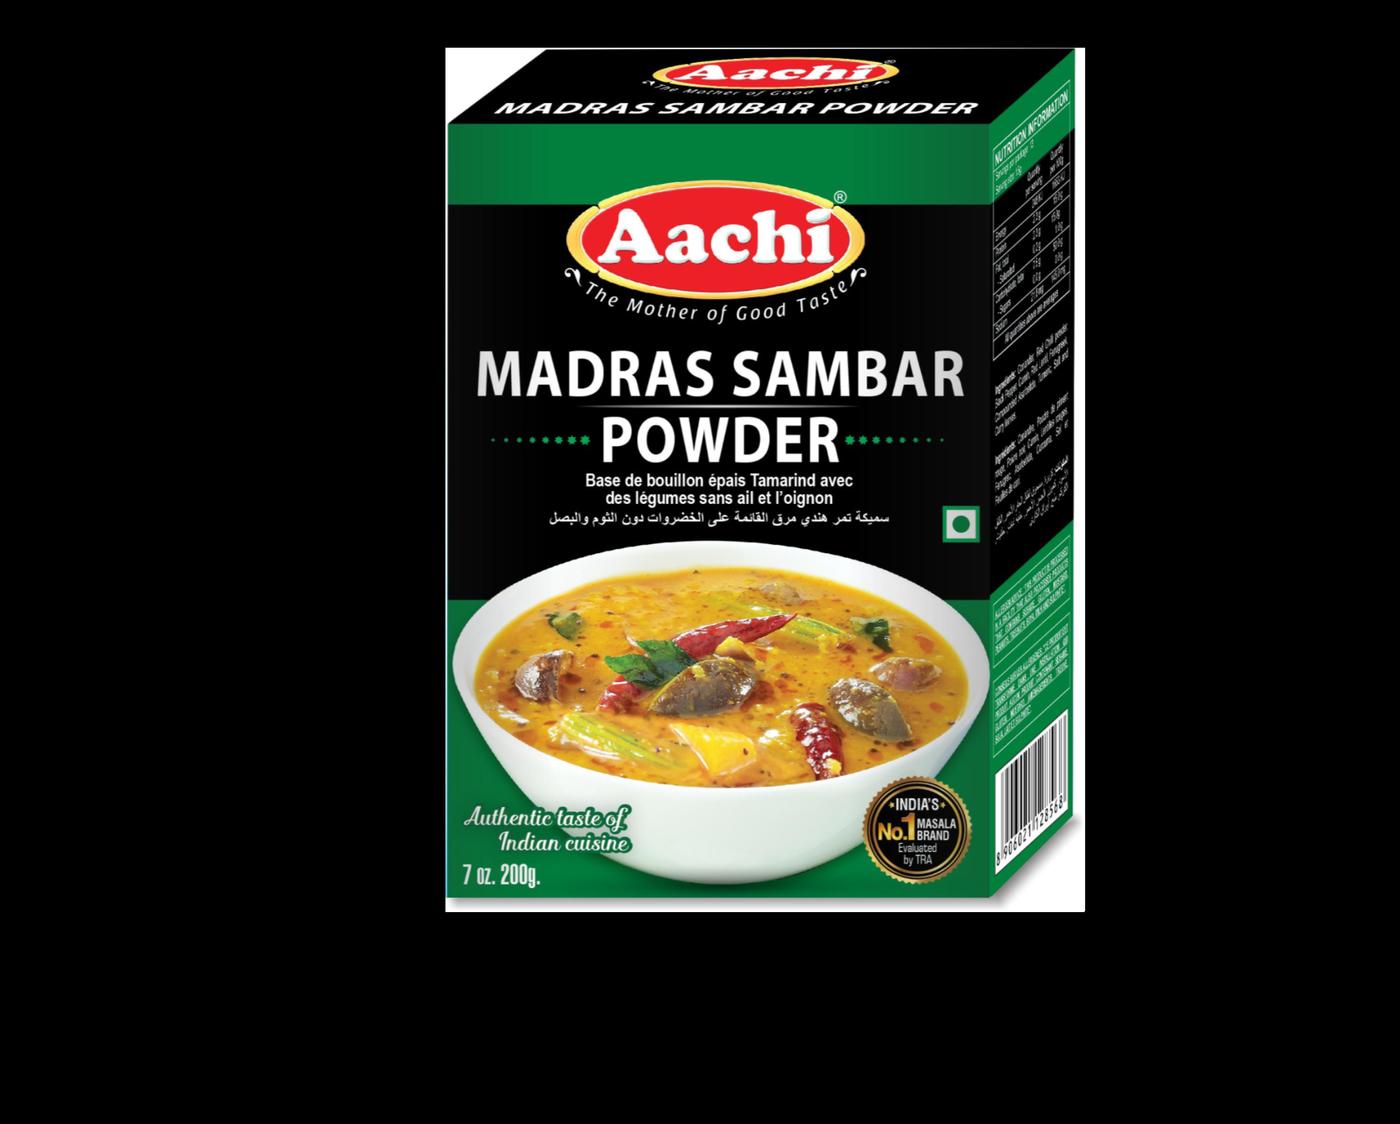 Aachi  Madras Sambar powder